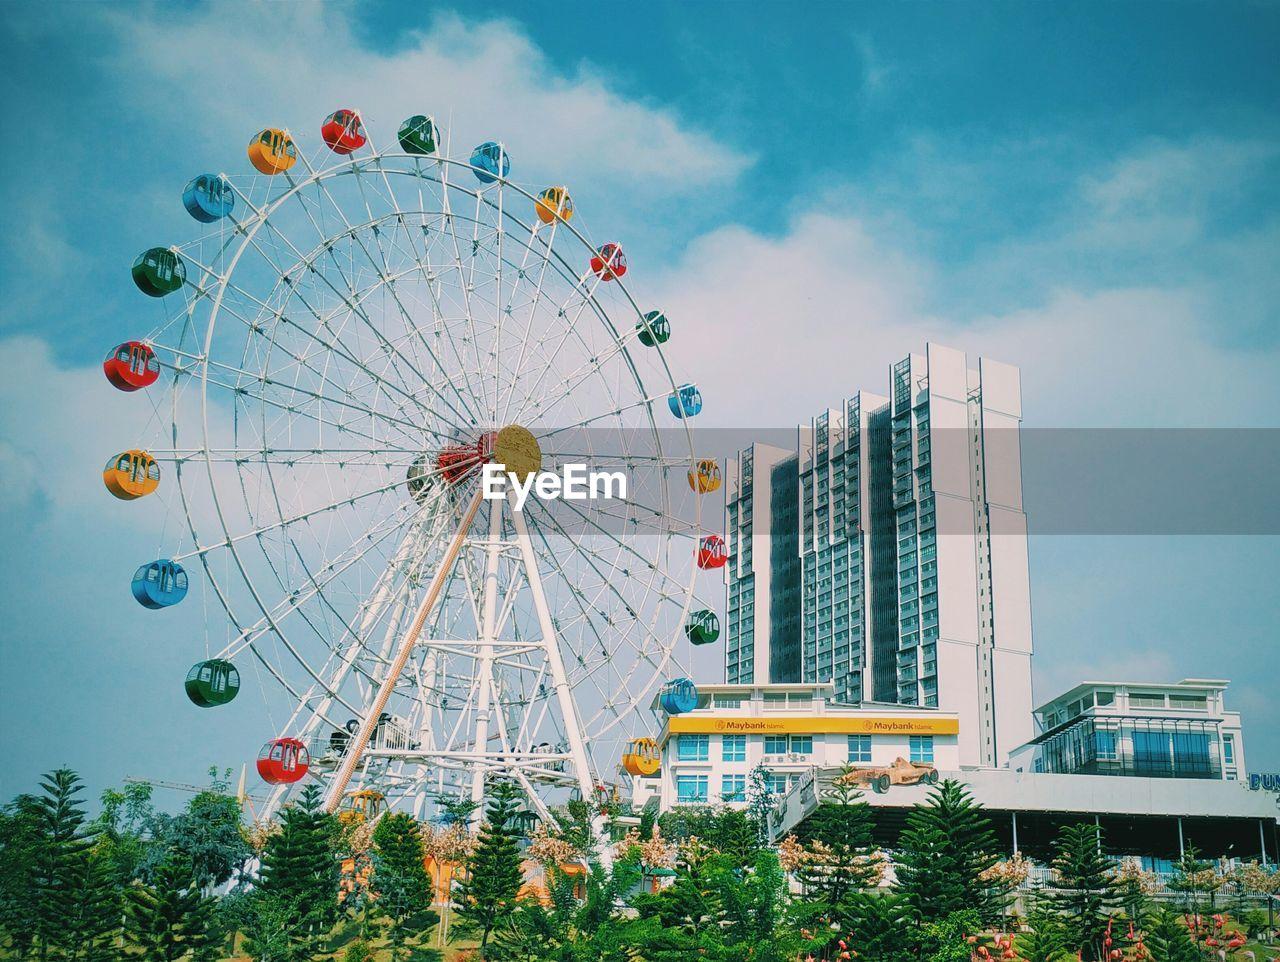 amusement park, ferris wheel, arts culture and entertainment, low angle view, sky, built structure, amusement park ride, architecture, building exterior, no people, day, big wheel, cloud - sky, outdoors, tree, city